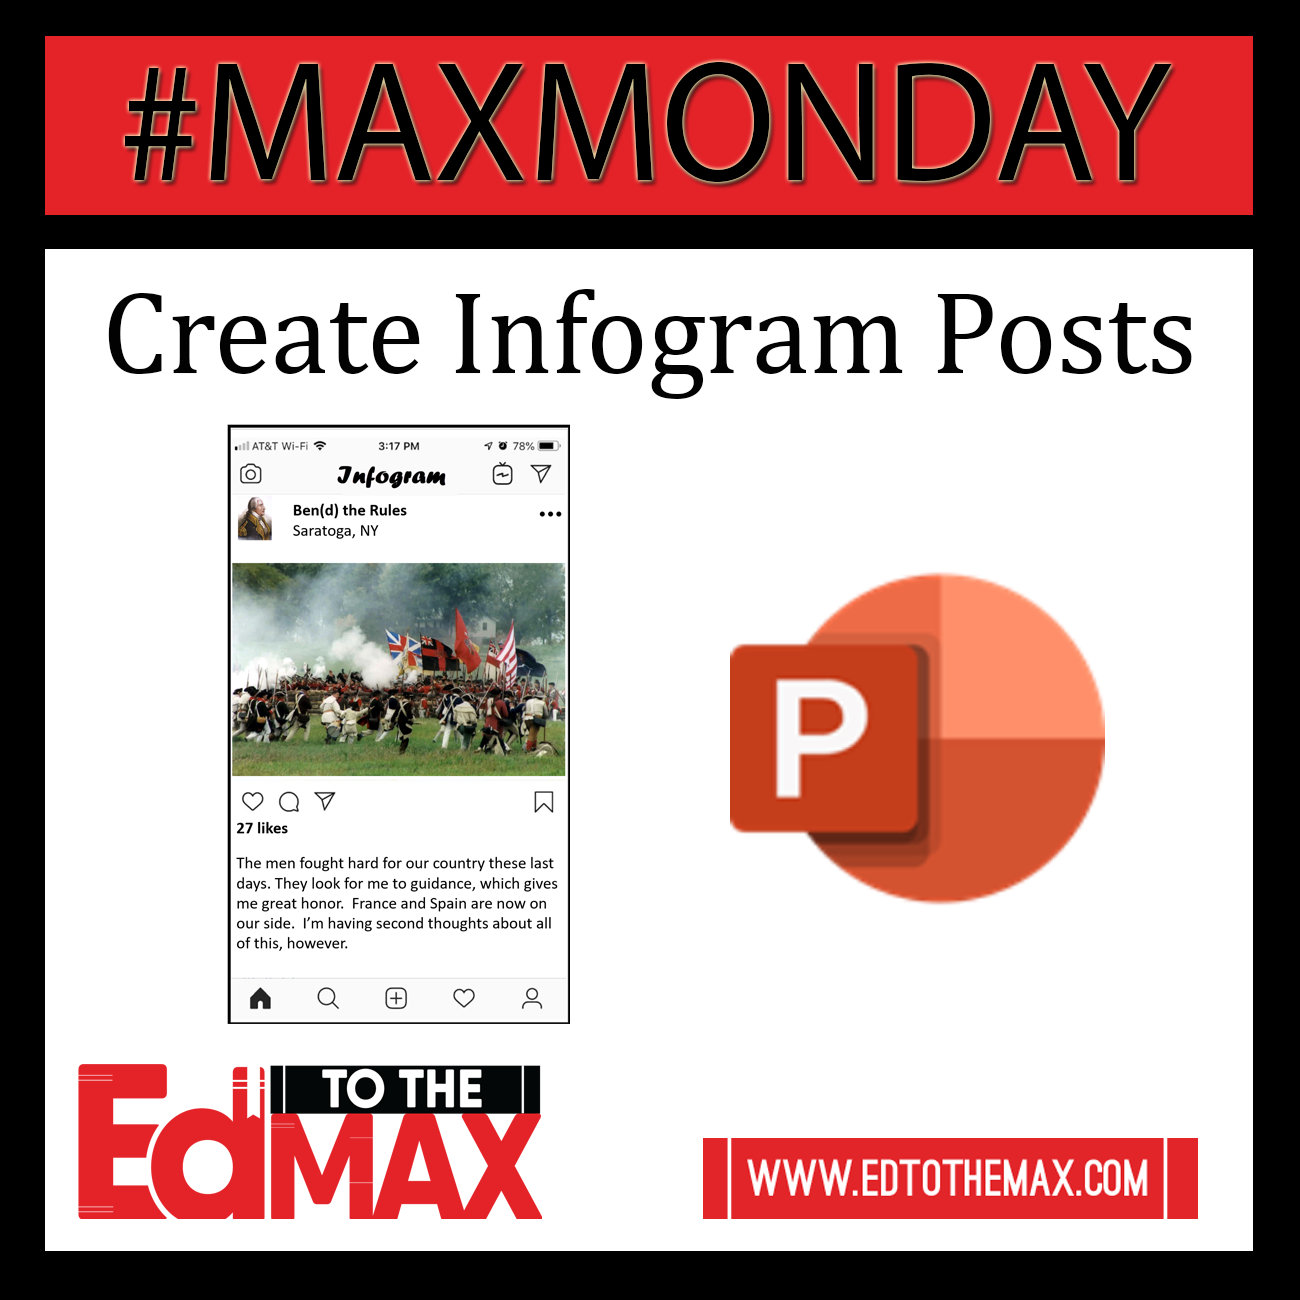 Create Infogram Posts